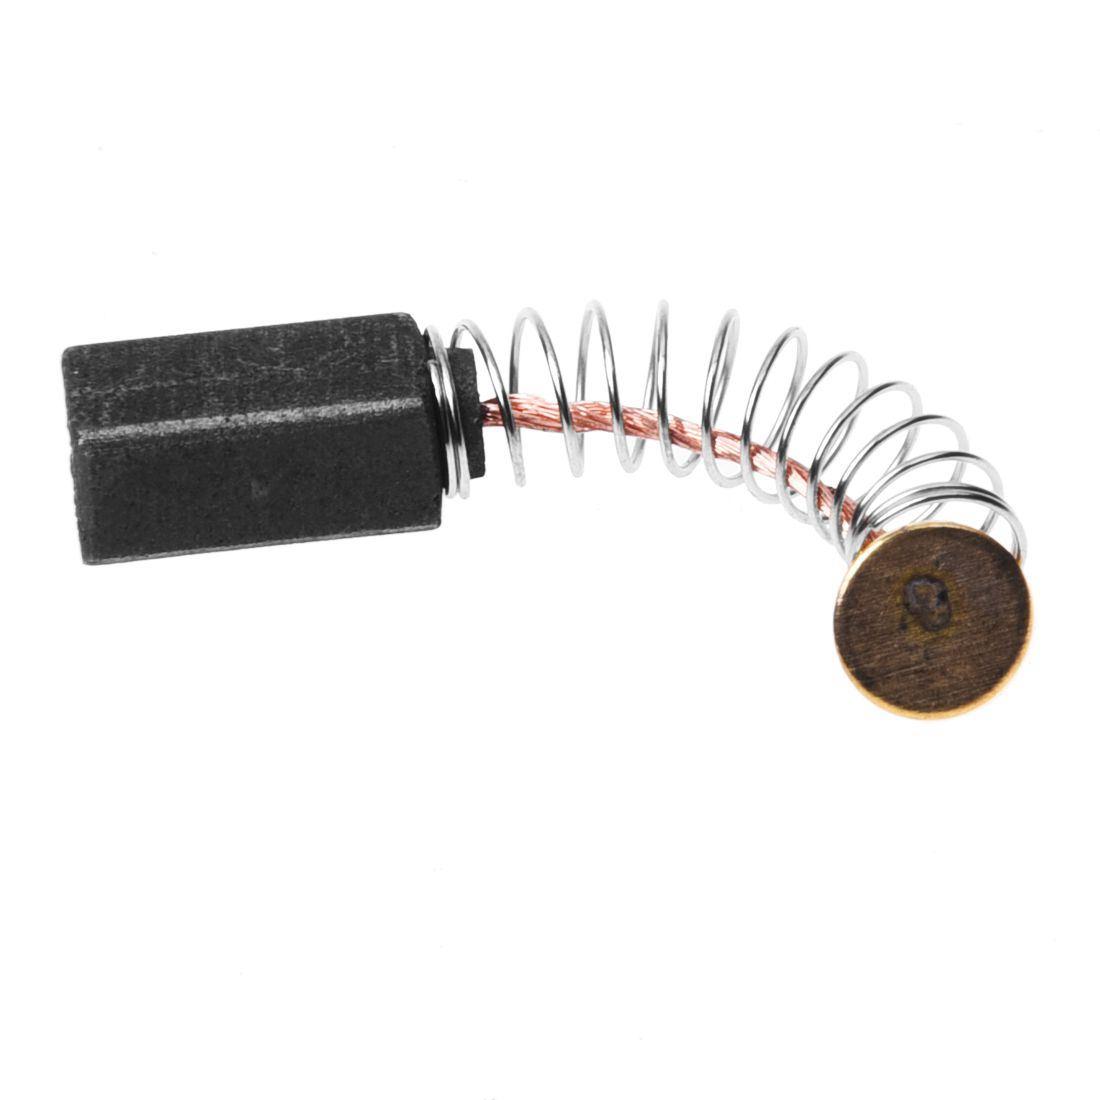 5x8x13mm 10 pcs Electrical Motor Carbon Brush